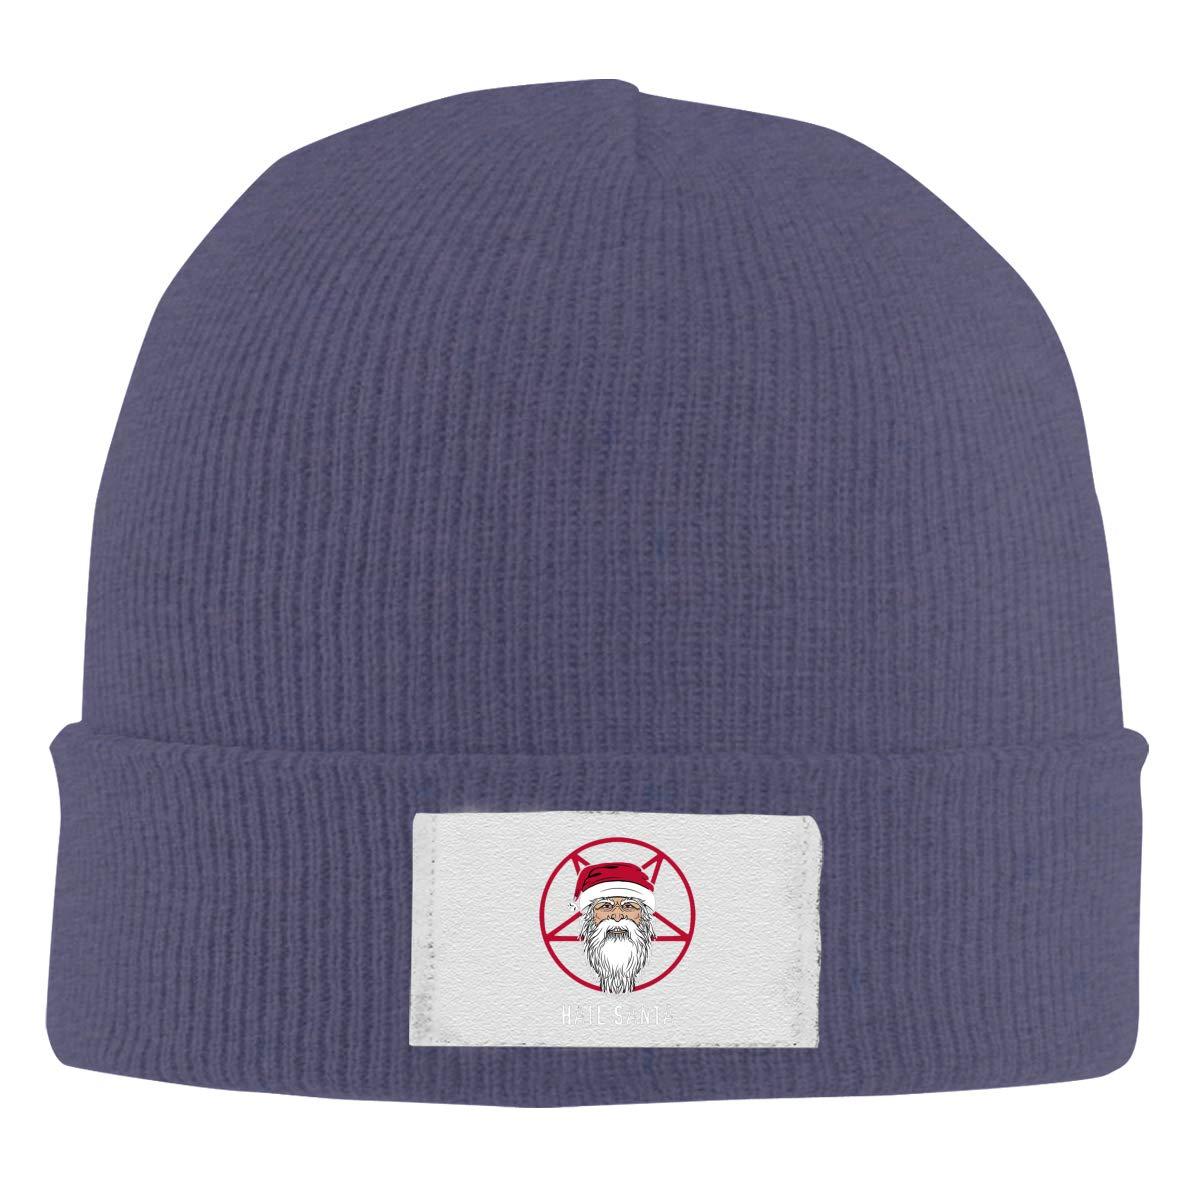 Stretchy Cuff Beanie Hat Black Dunpaiaa Skull Caps Hail Santa Winter Warm Knit Hats